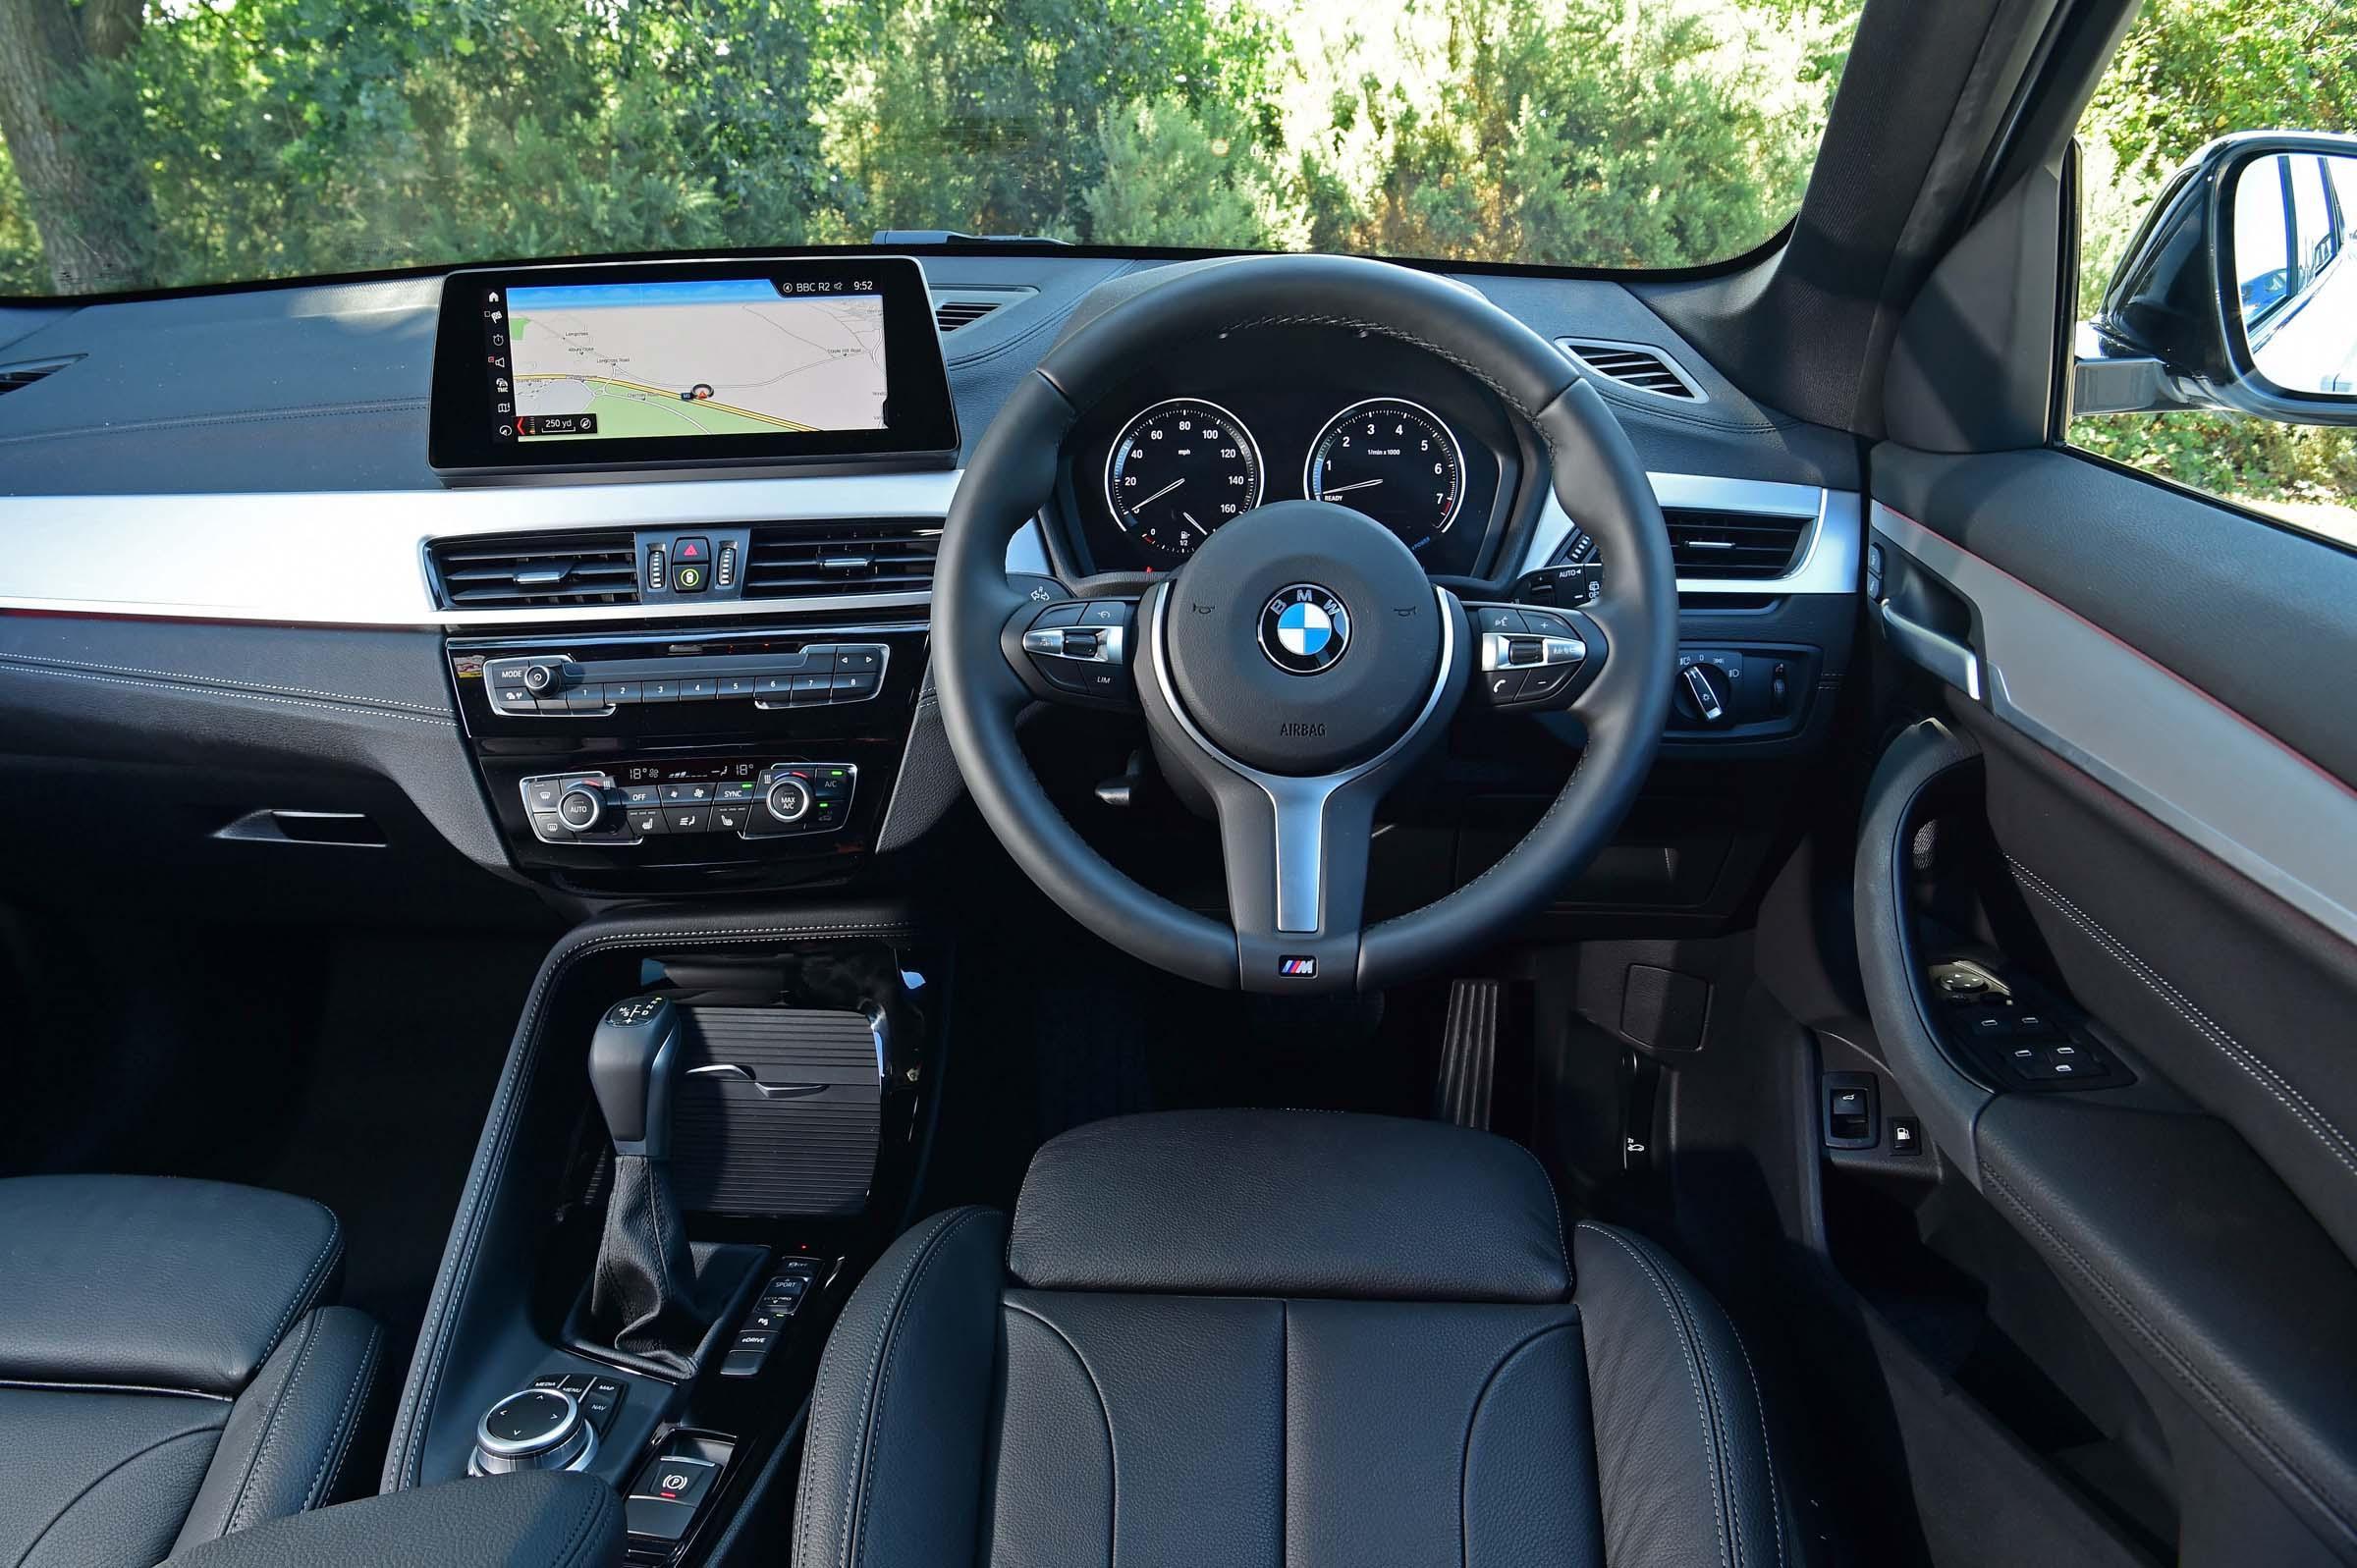 Bmw X1 Hybrid Interior Comfort Drivingelectric